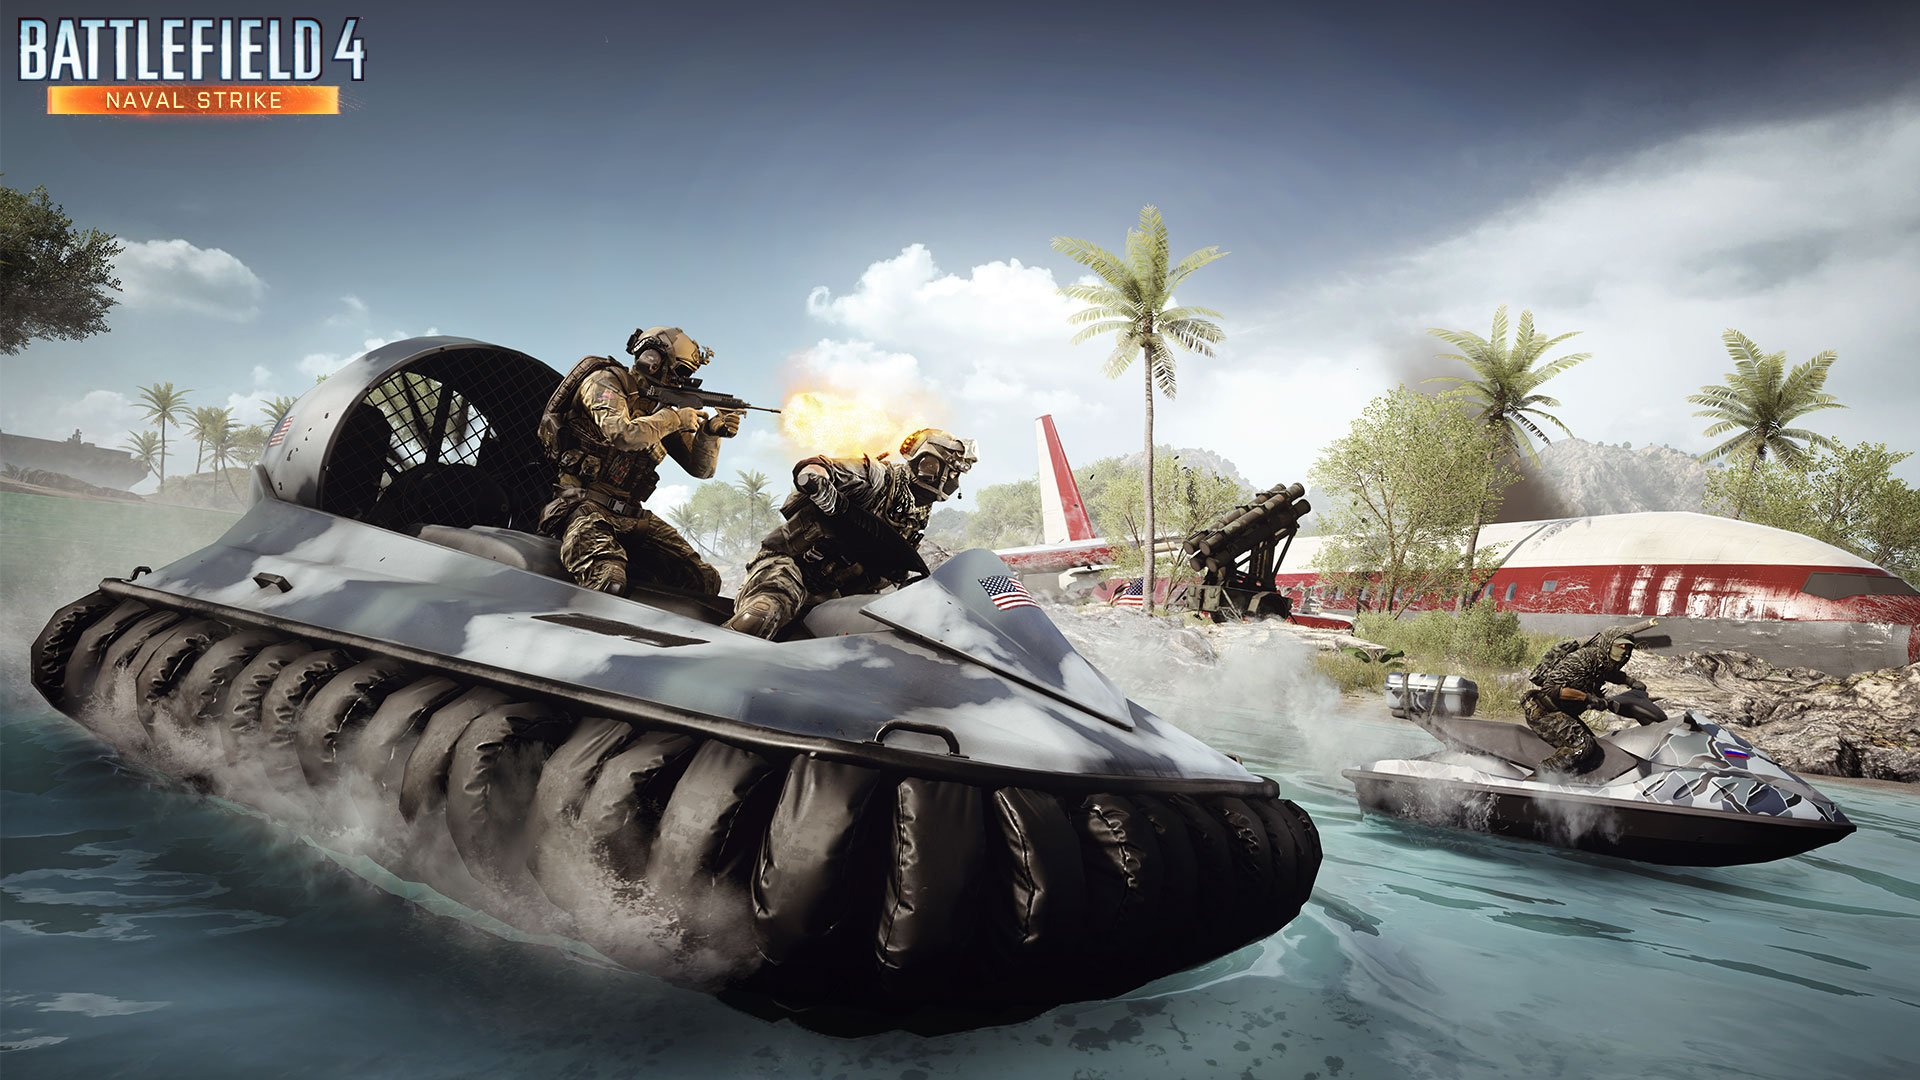 Battlefield 4: Разбор карт, новый режим, техника. - Изображение 5